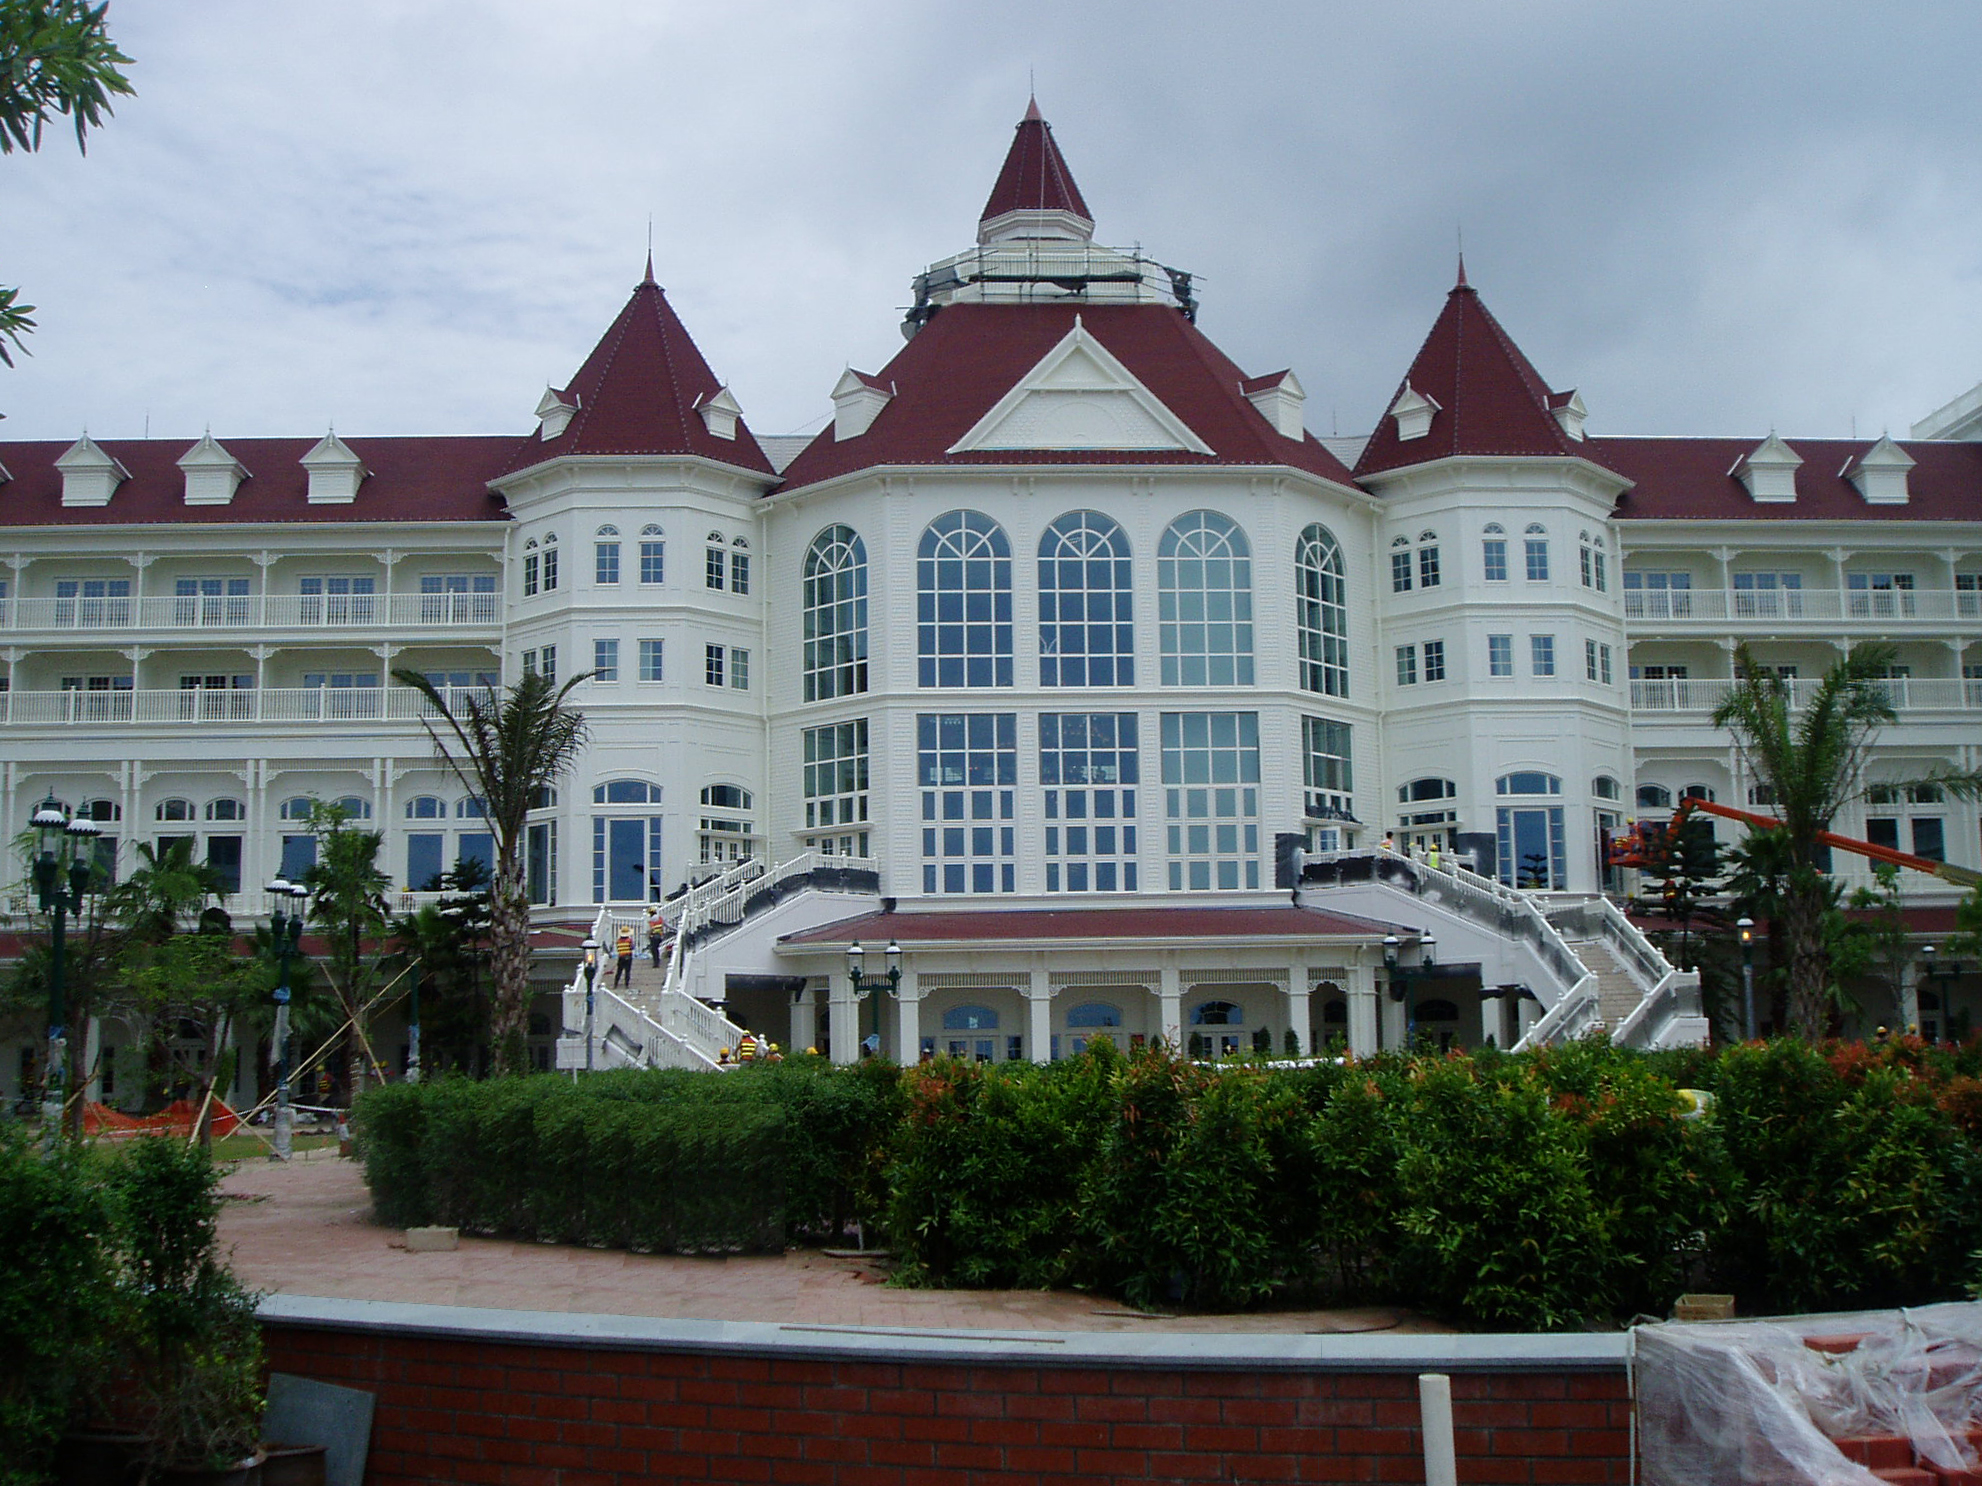 Hotels_Disney Hong Kong2.jpg